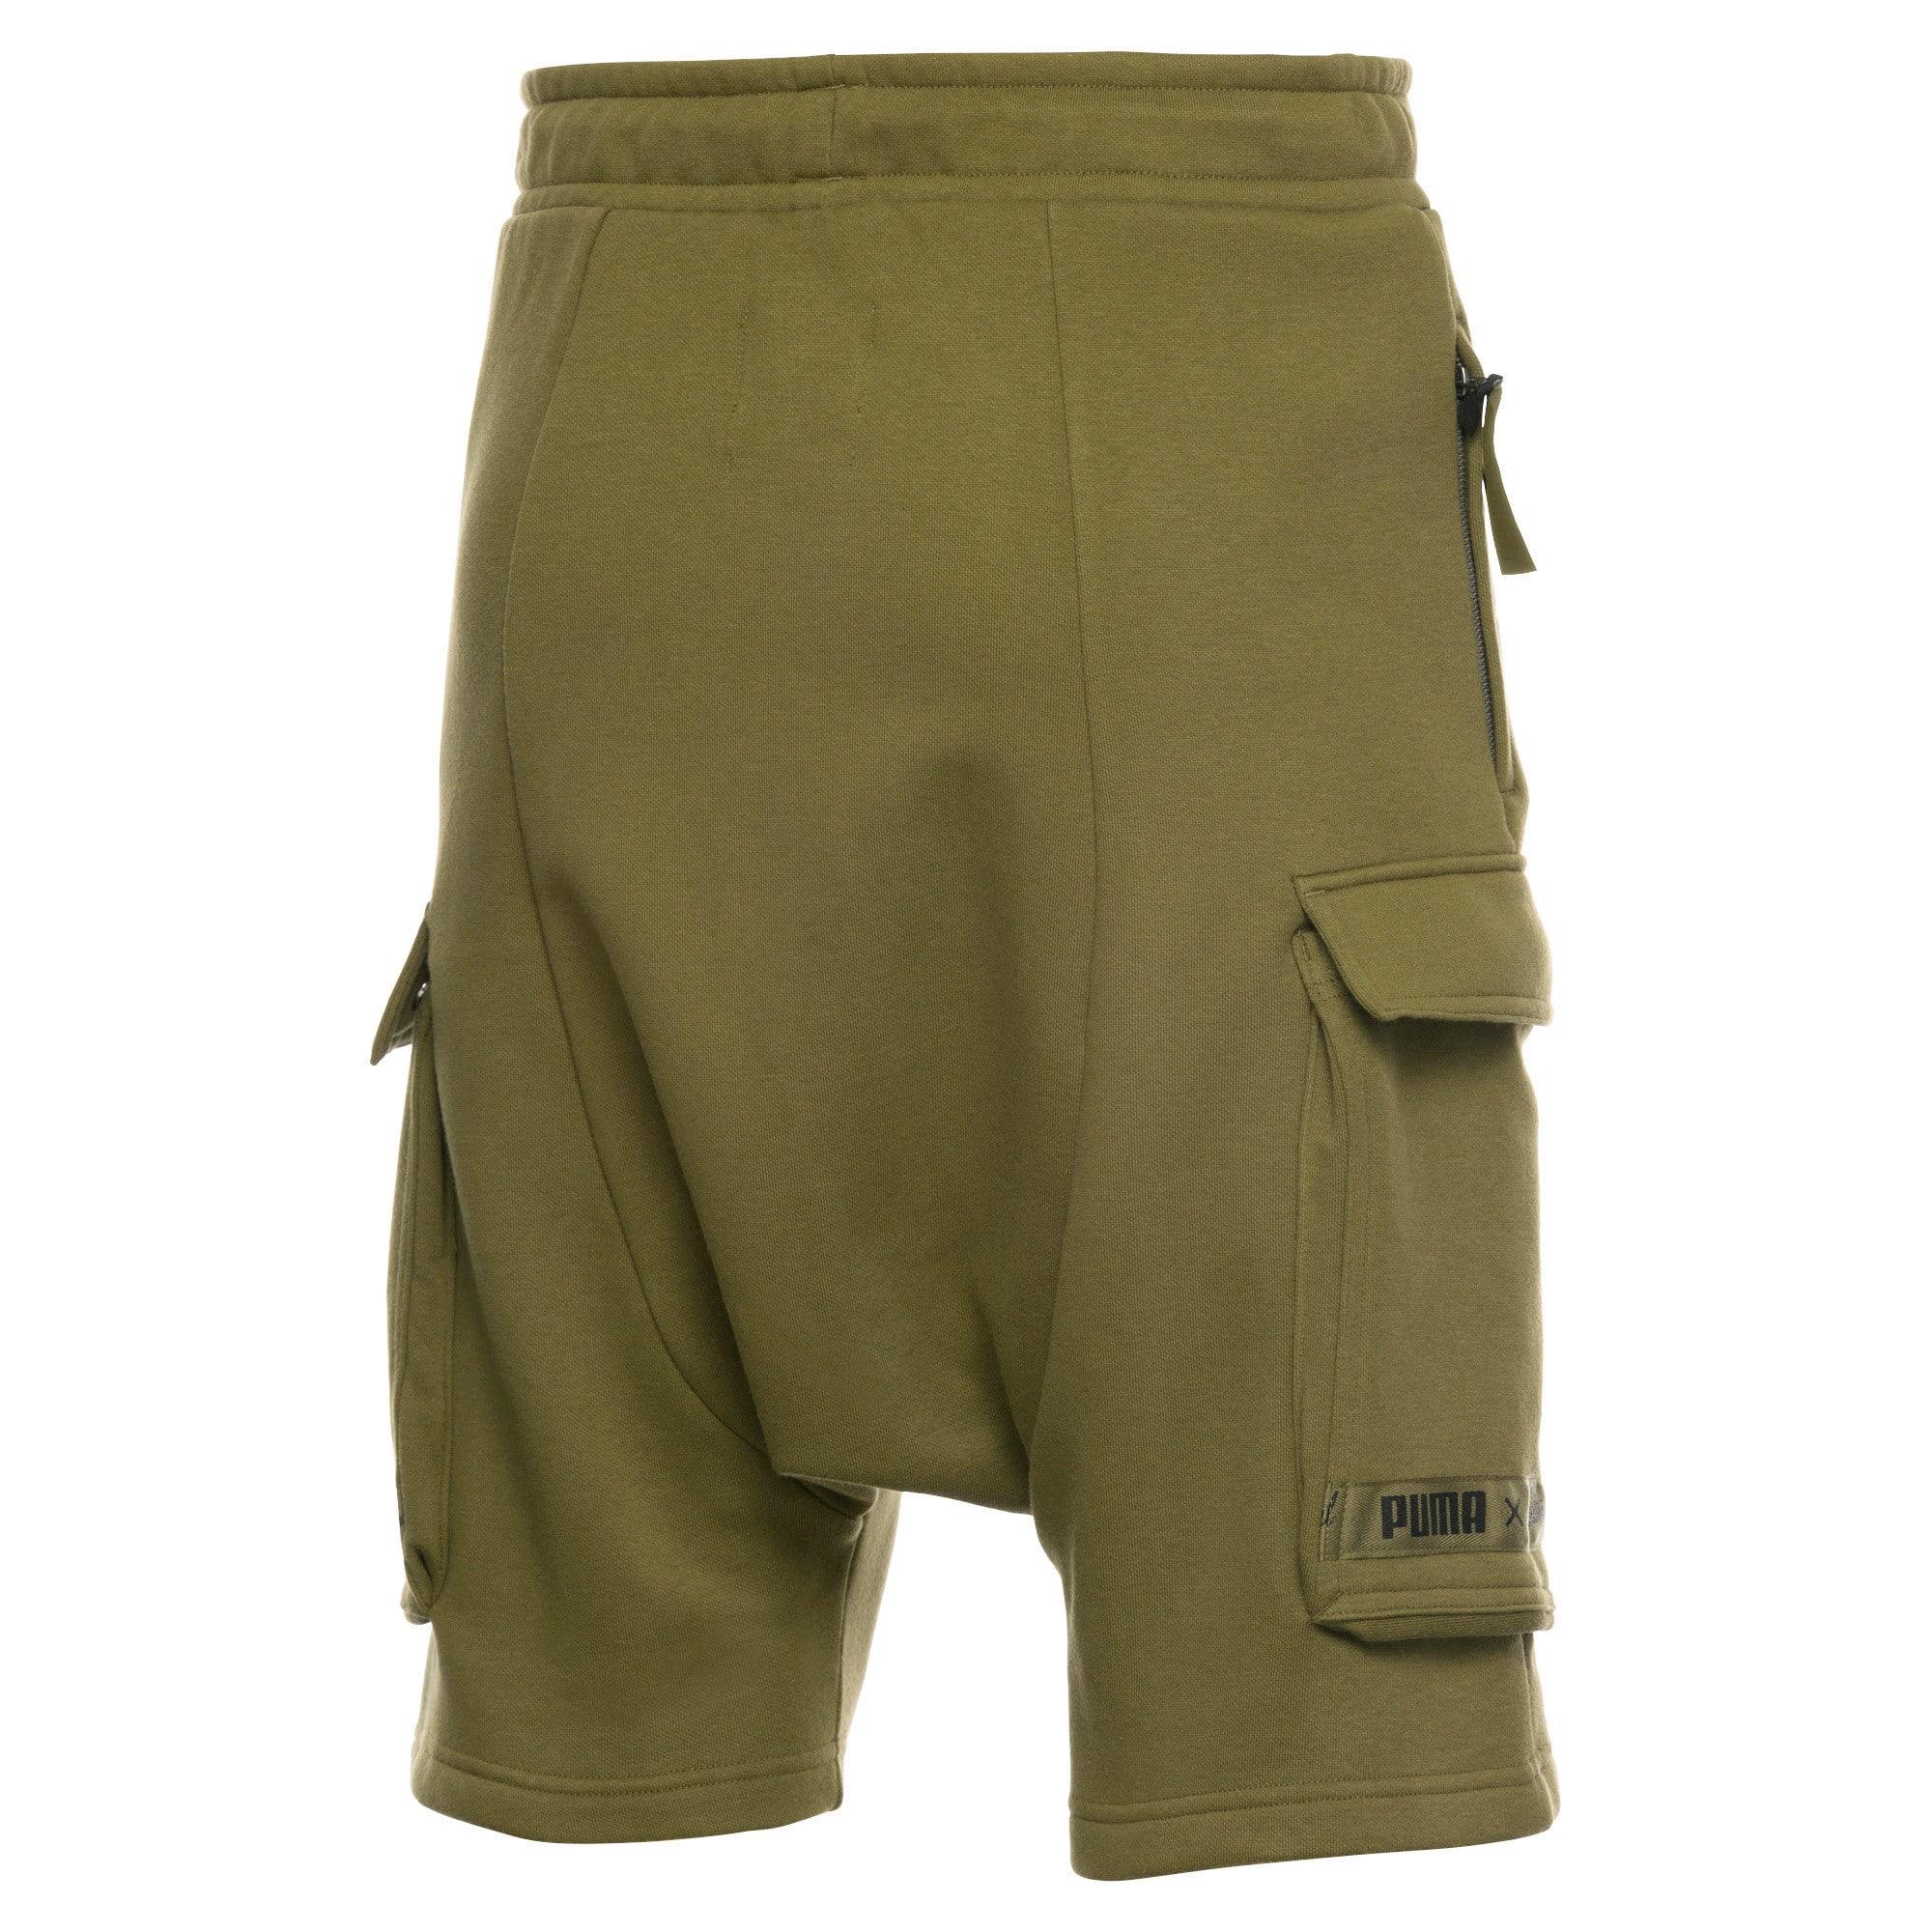 Thumbnail 5 of PUMA x NATUREL Men's Shorts, Avocado, medium-IND